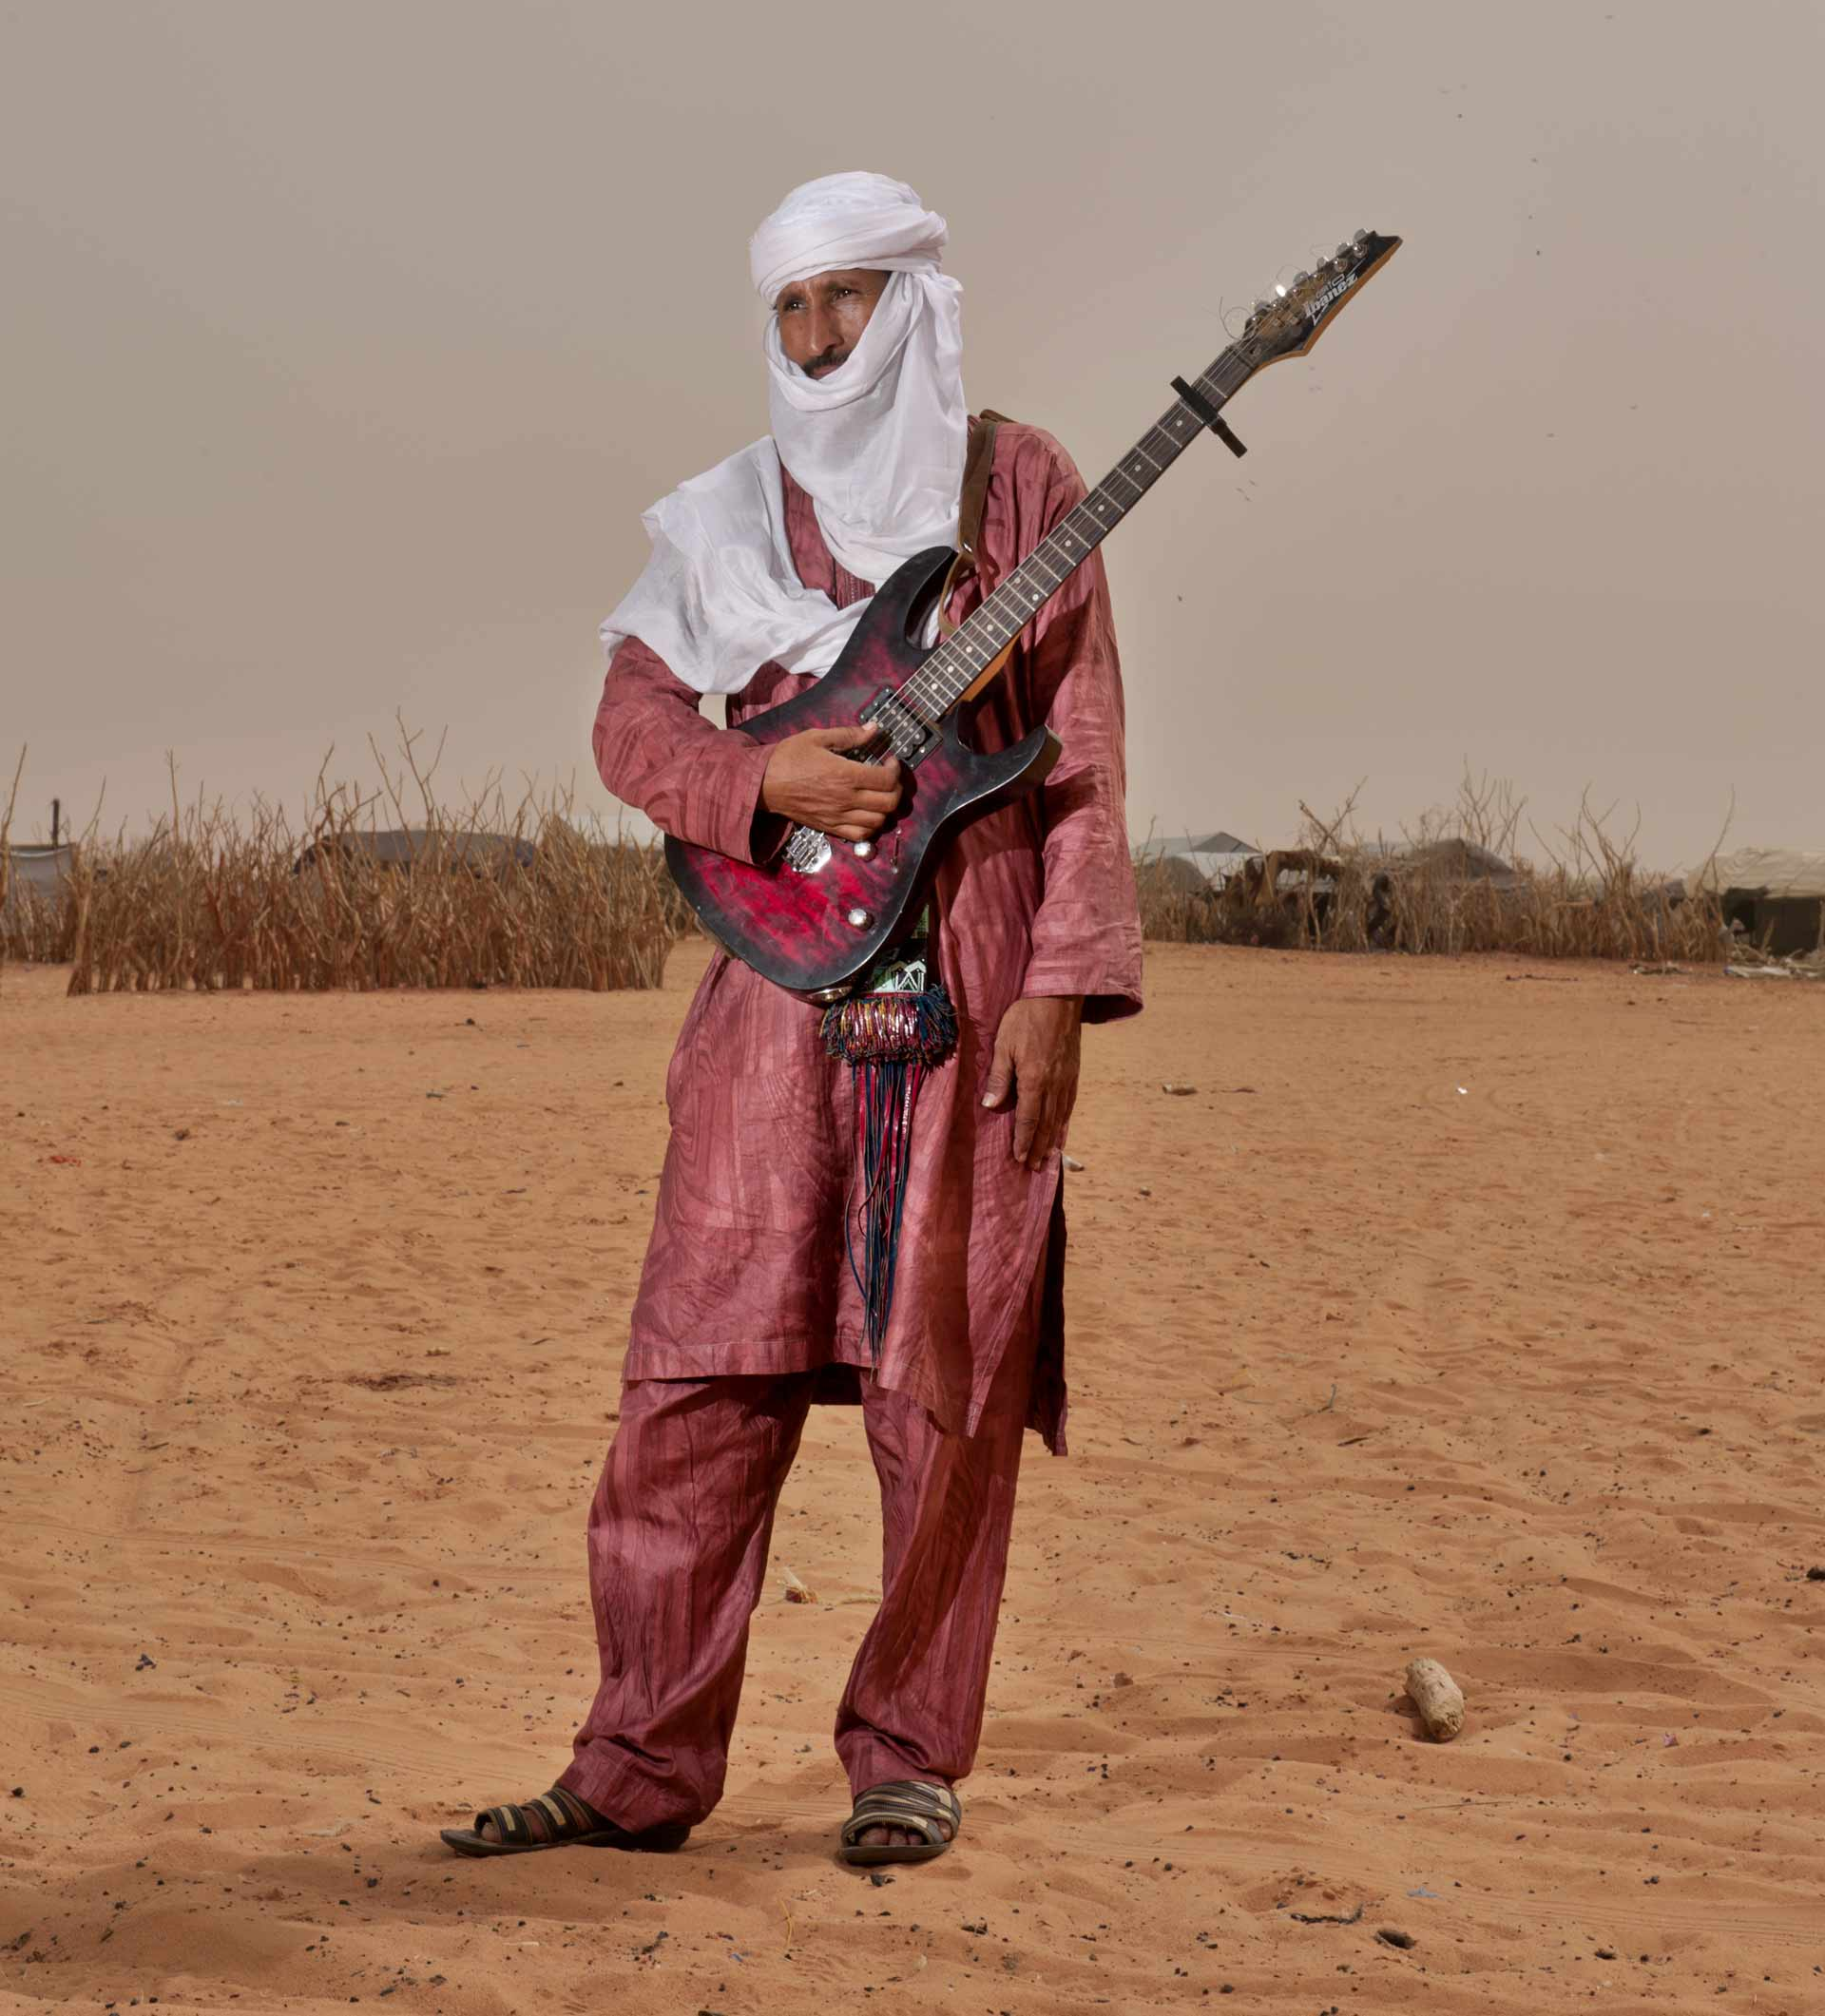 Mohamed Issa Ag Oumar chitarrista dell'album Khalab & M'Berra Ensemble